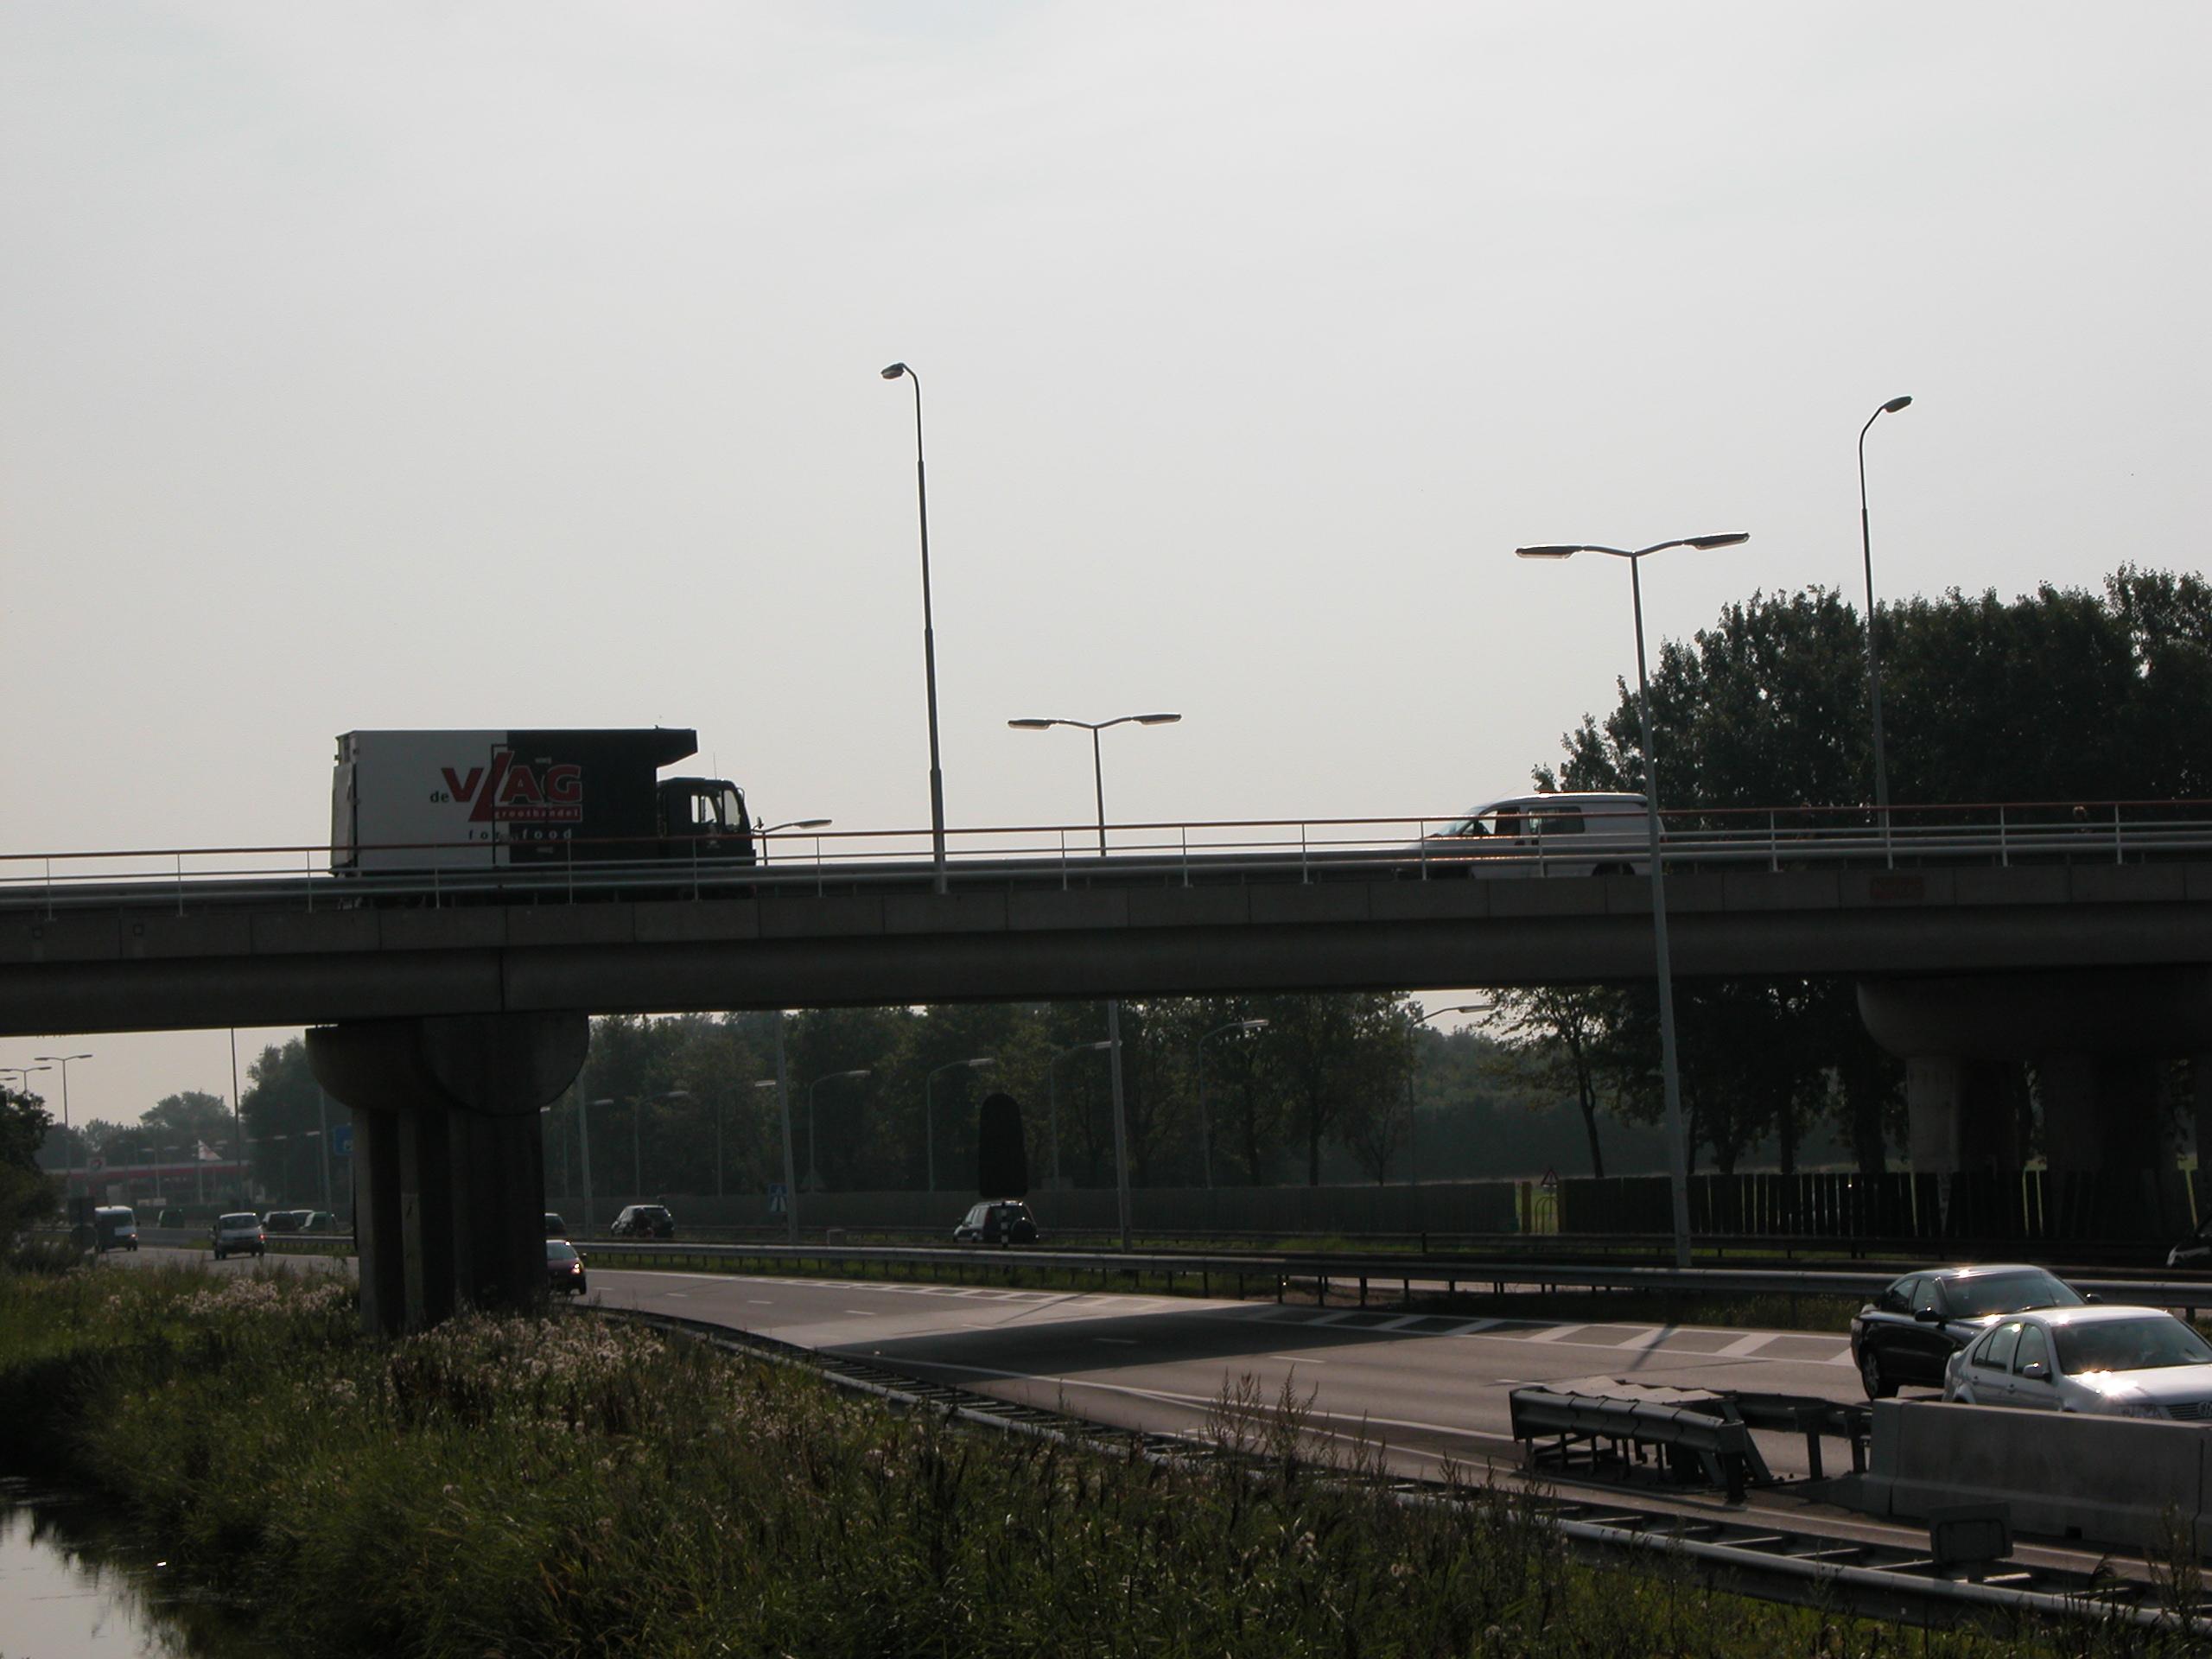 architecture exteriors bridge vehicles land car cars traffic road highway